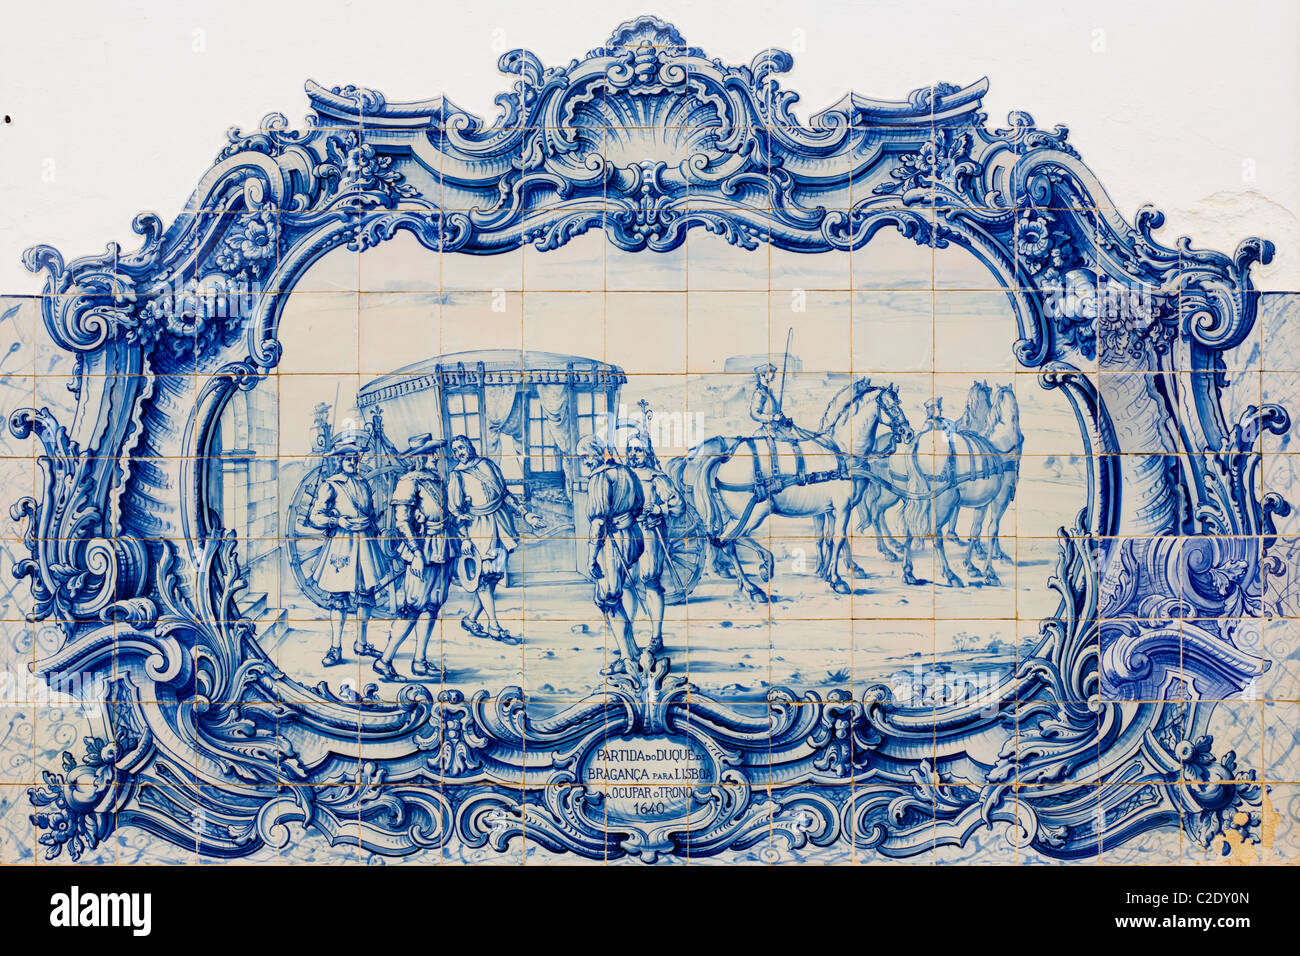 Duke of Bragança history depicted in tiles (azulejos) at Marble Museum, Vila Viçosa, Portugal - Stock Image